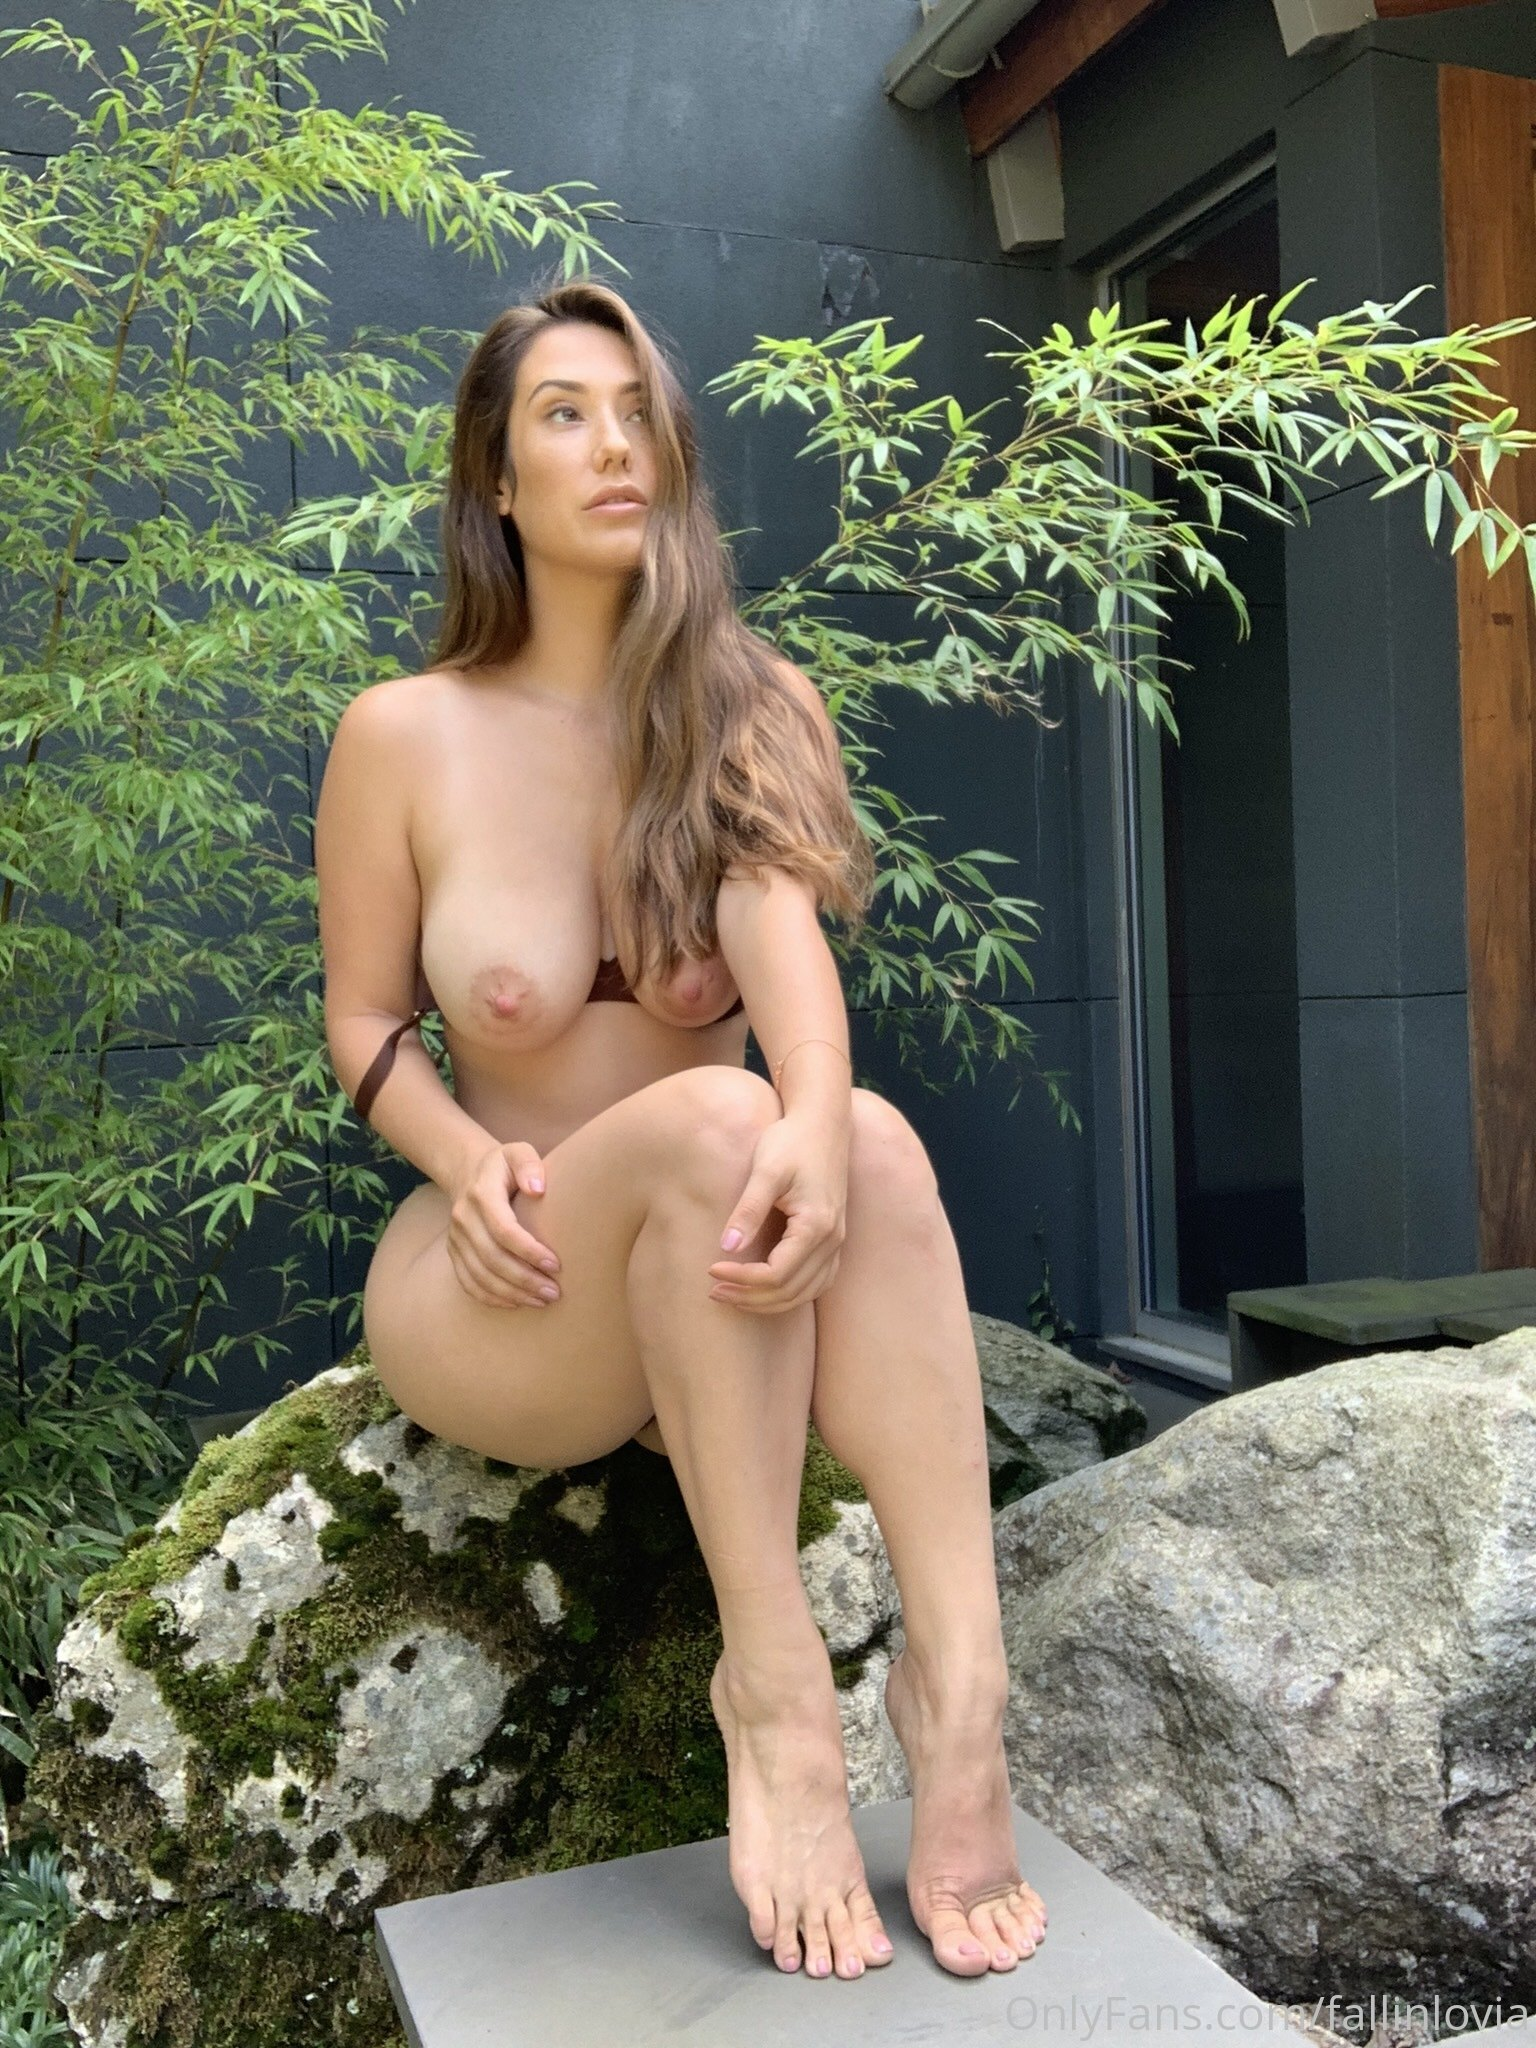 Eva Lovia, Fallinlovia, Onlyfans 0246